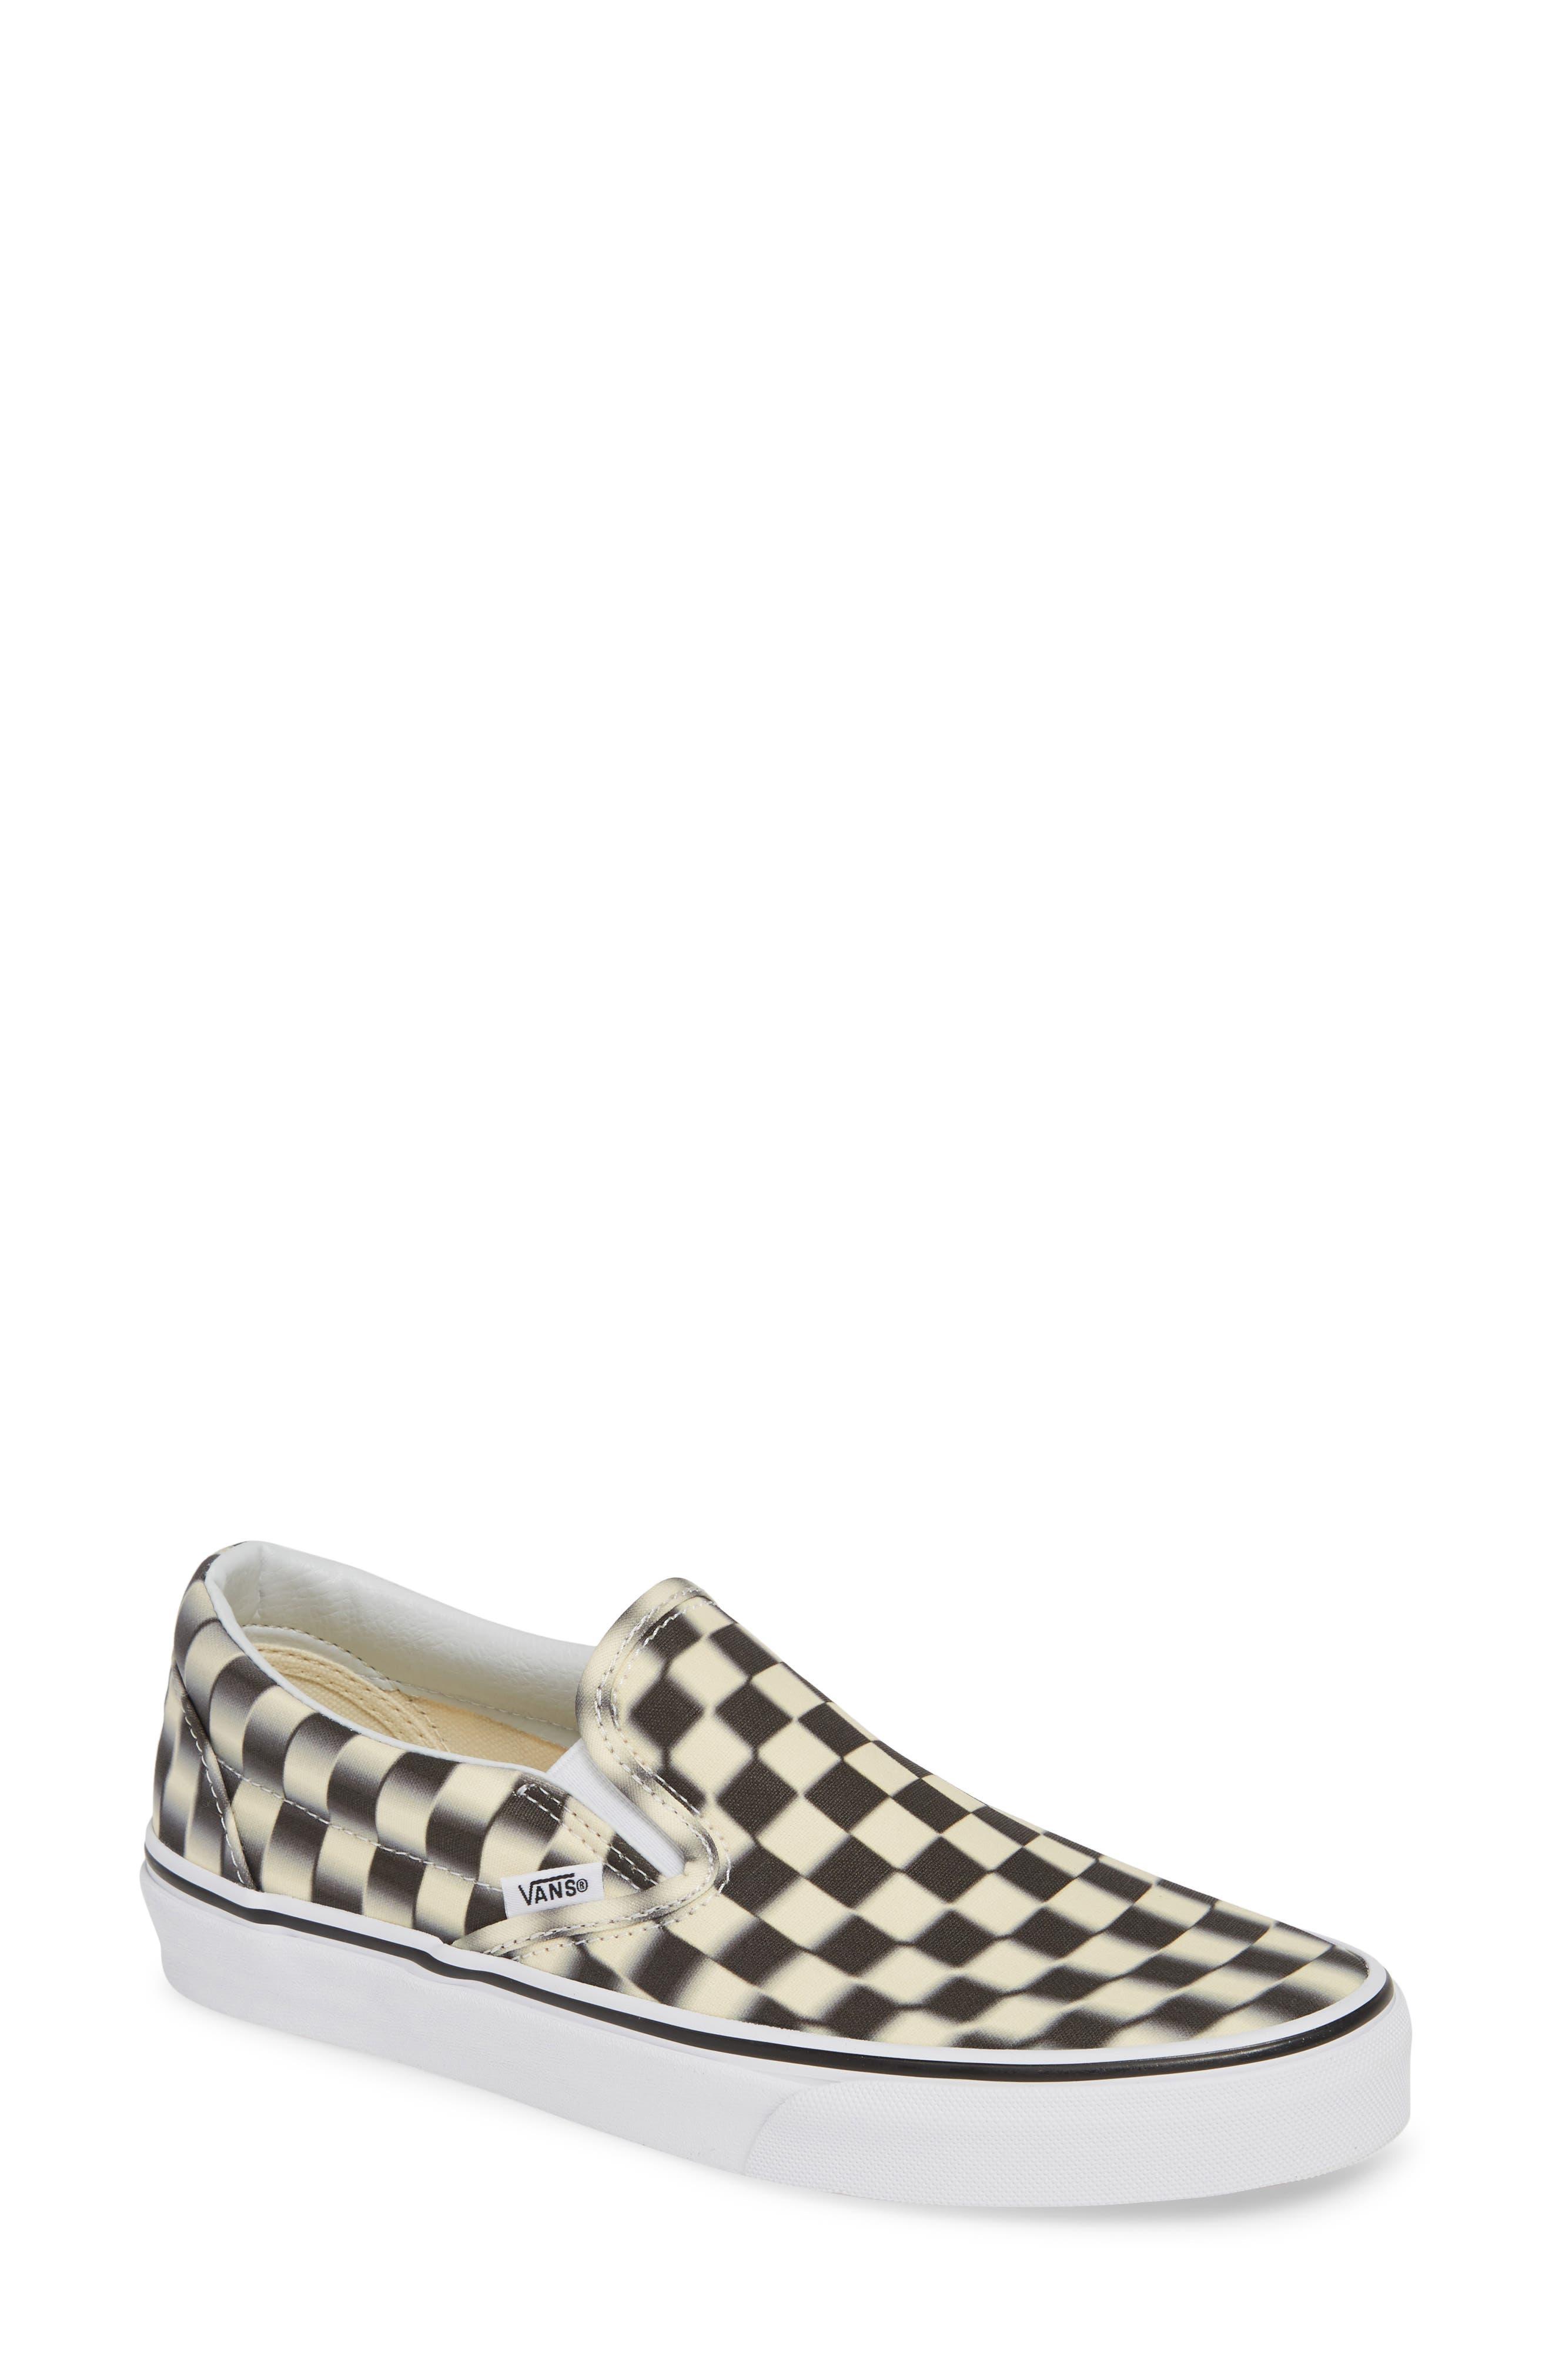 Classic Slip-On Sneaker, Main, color, 011